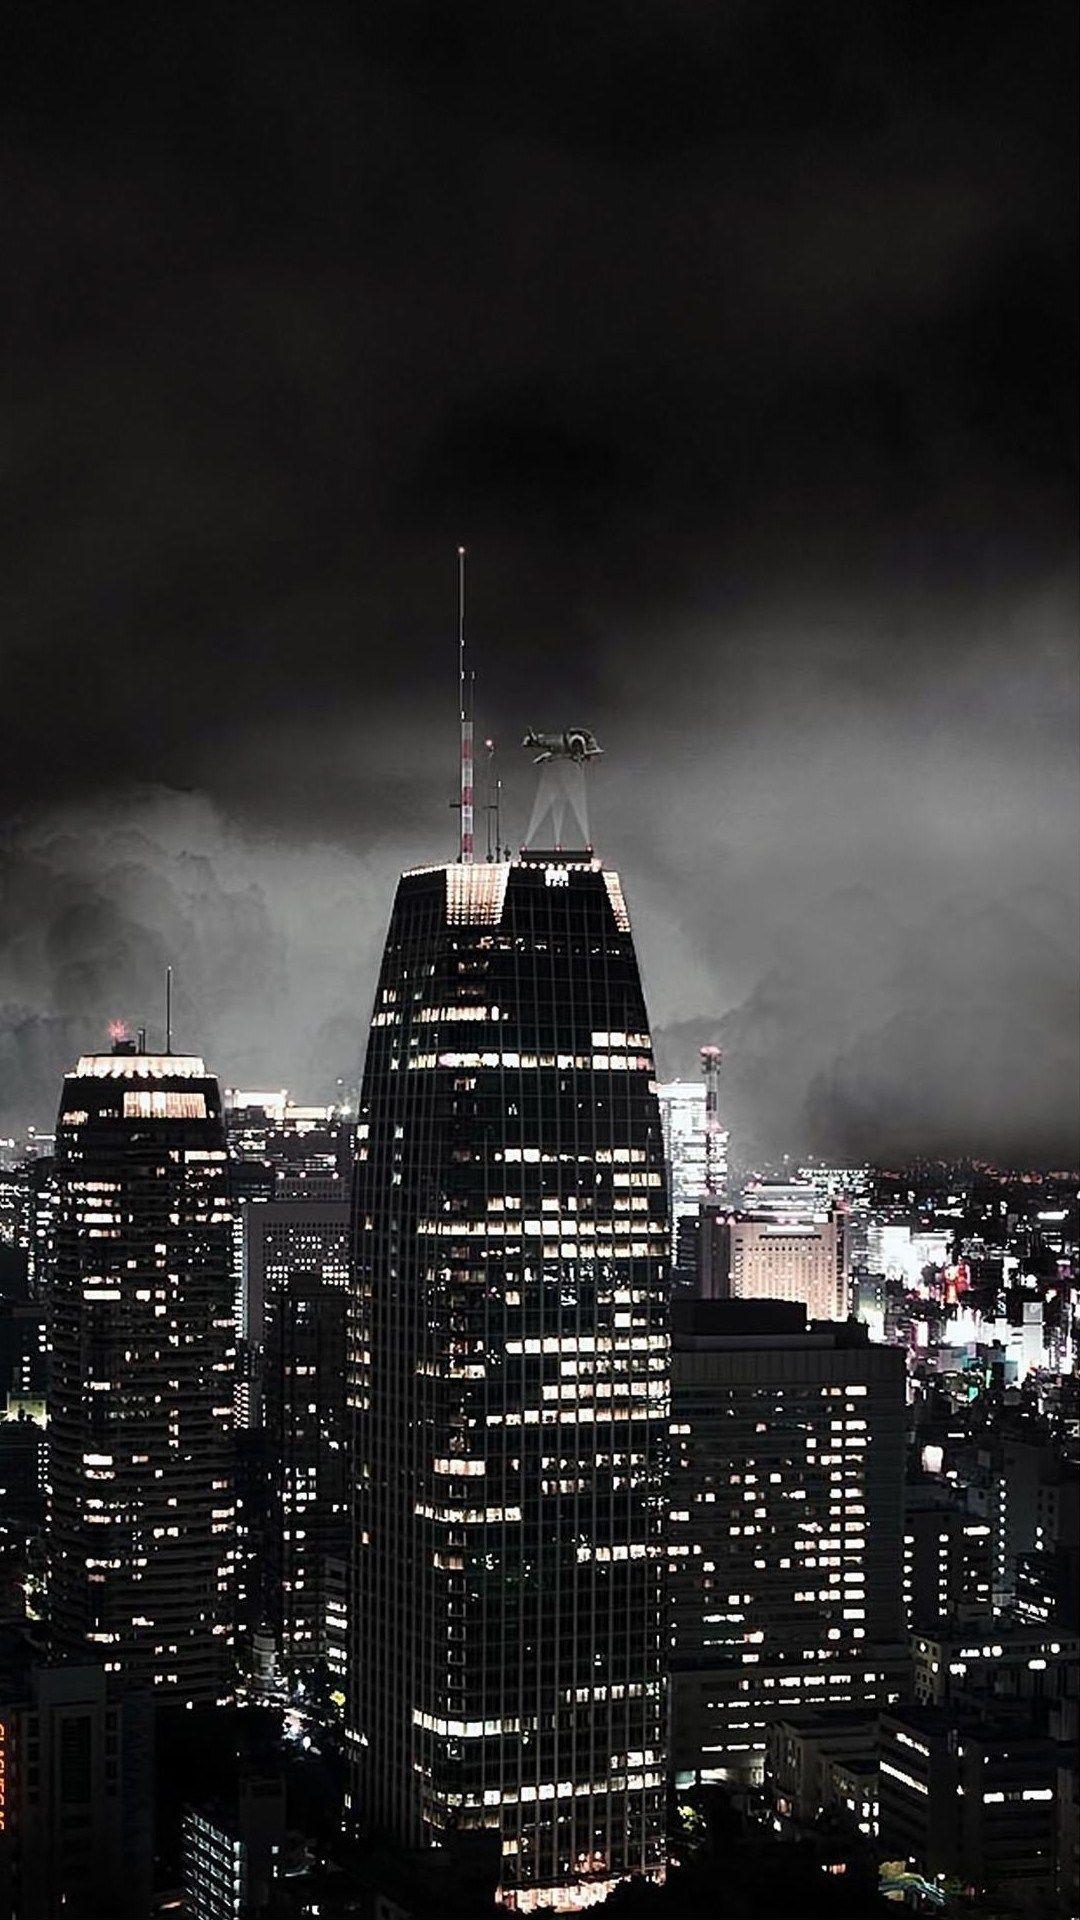 dark gothic night city iphone wallpaper City iphone